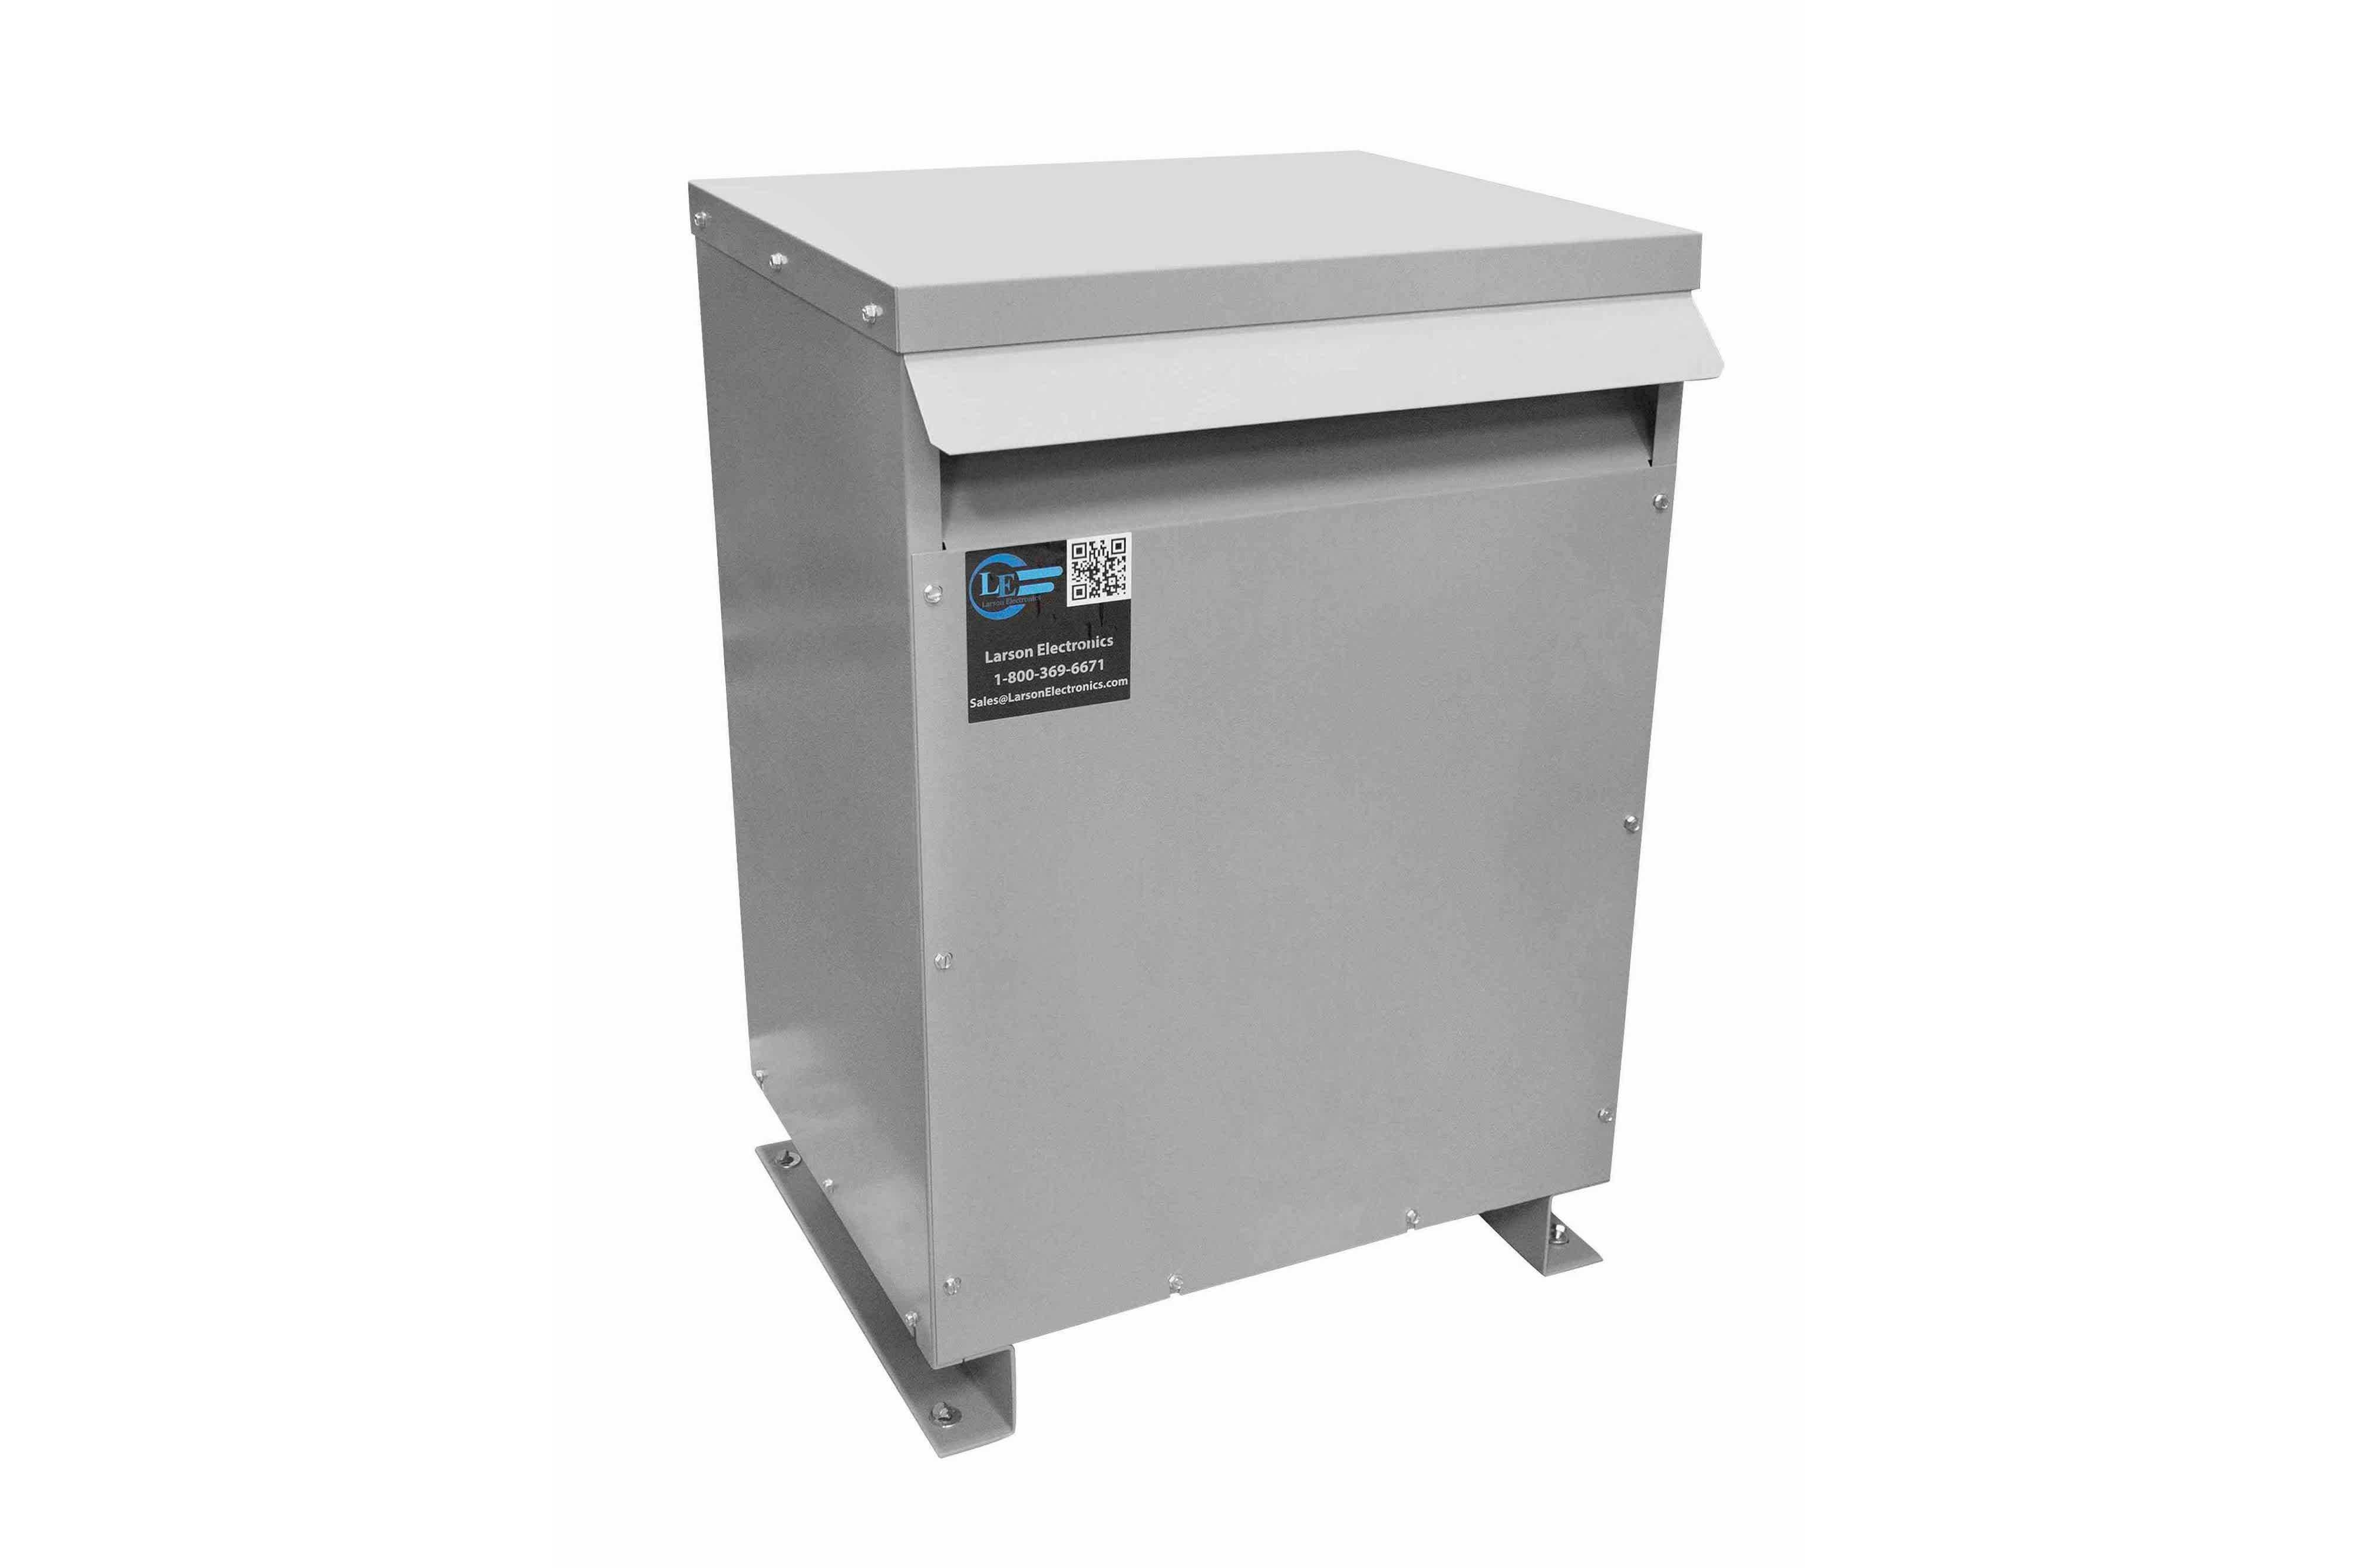 75 kVA 3PH DOE Transformer, 480V Delta Primary, 380Y/220 Wye-N Secondary, N3R, Ventilated, 60 Hz